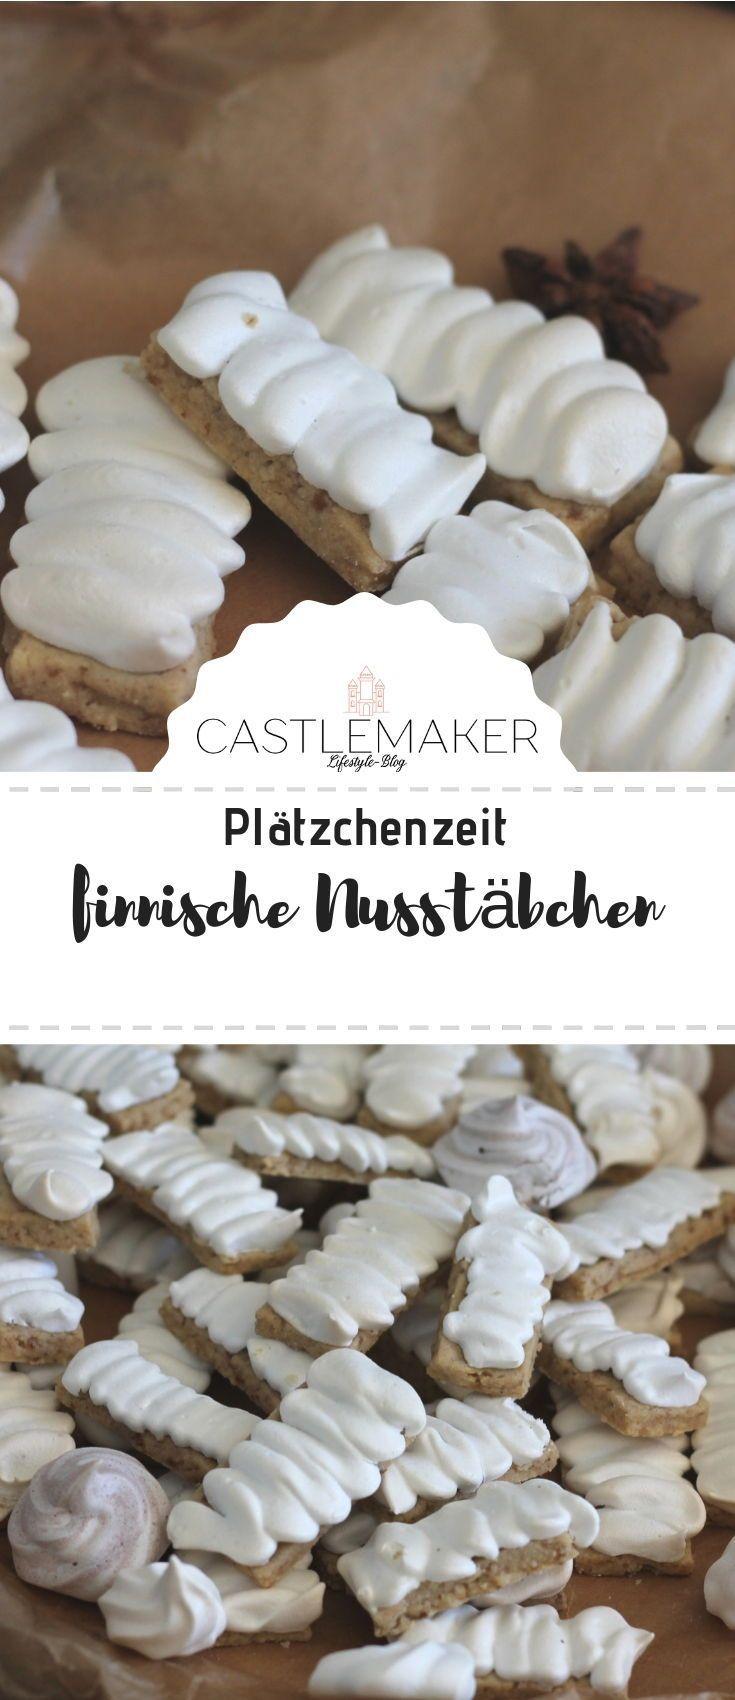 Delicious nut sticks for the cookie dish or just like that Tender nut   Castlemaker LifestyleBlog Rezepte  mehr